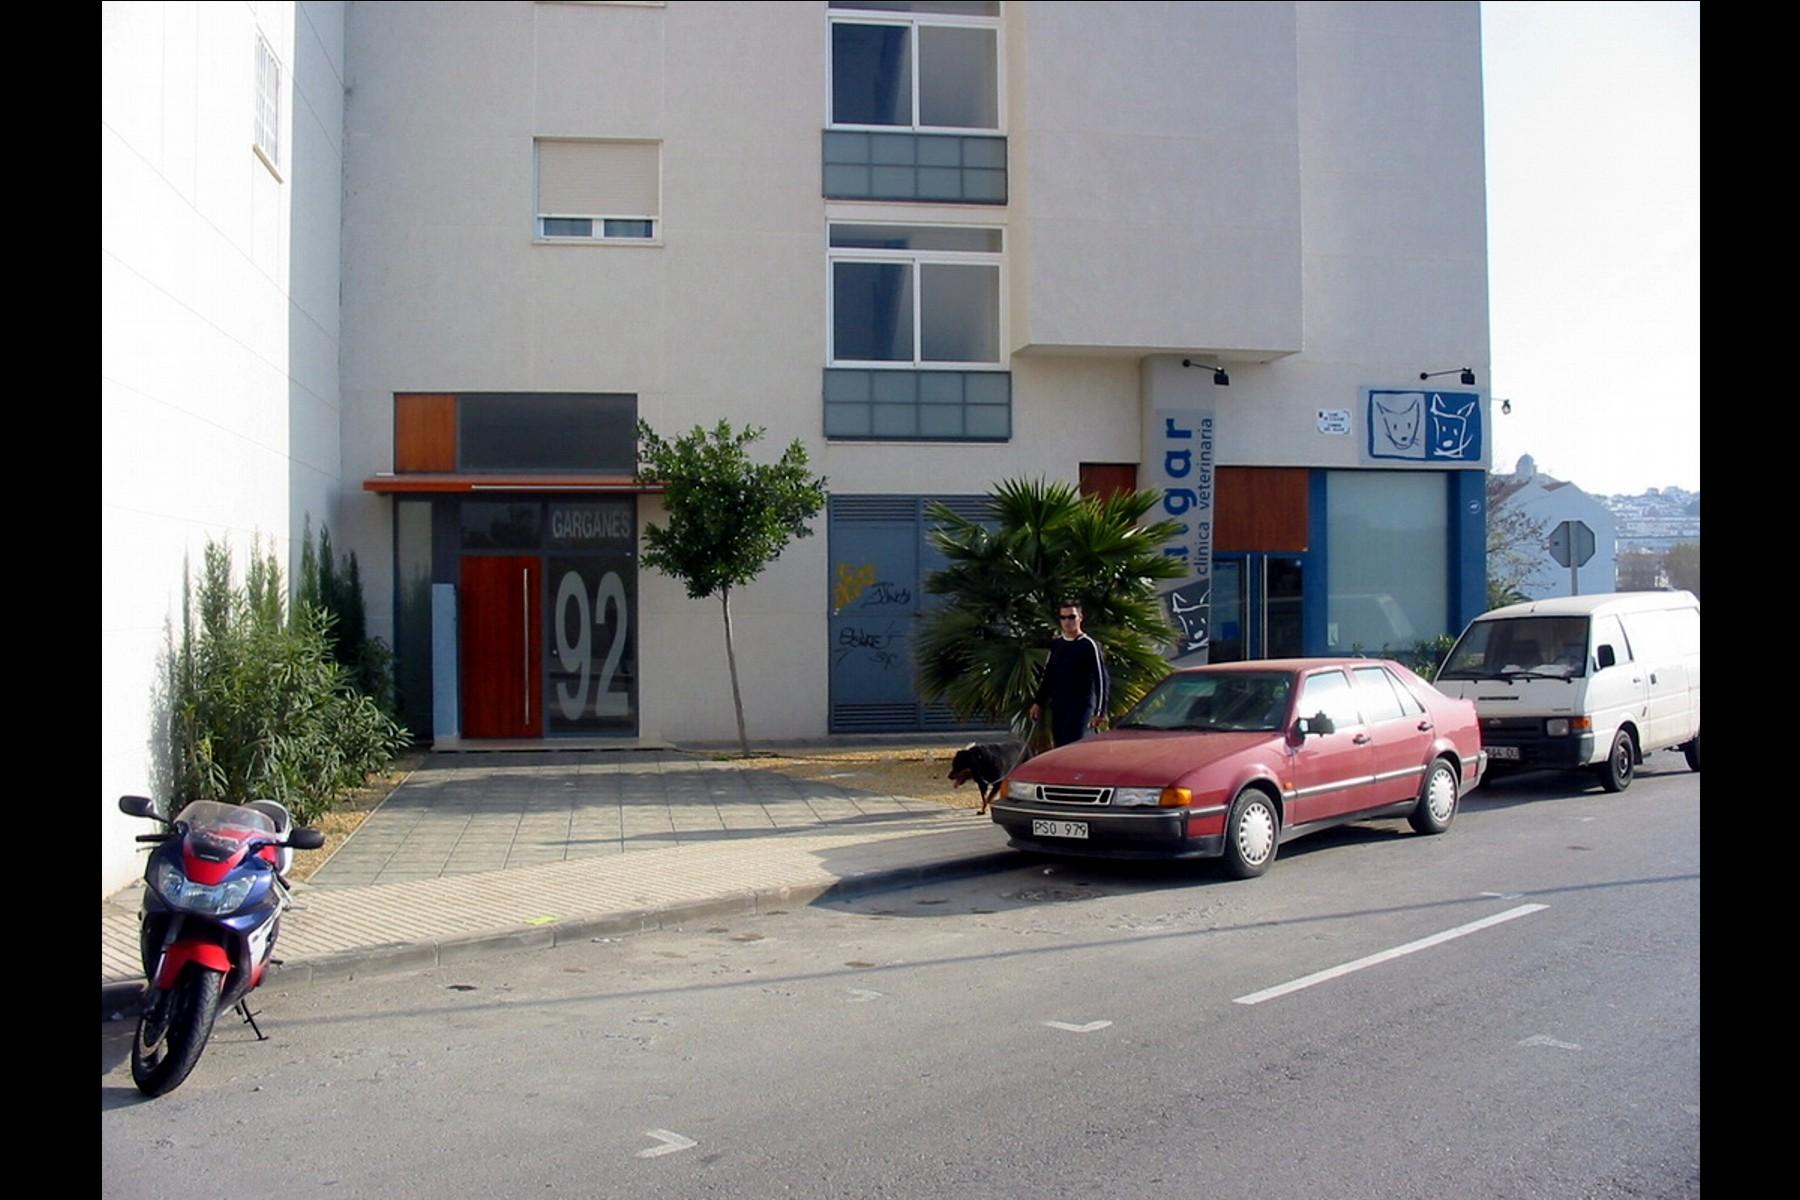 Imaginarq-053-Edificio-Viviendas-Altea-Alicante-21A